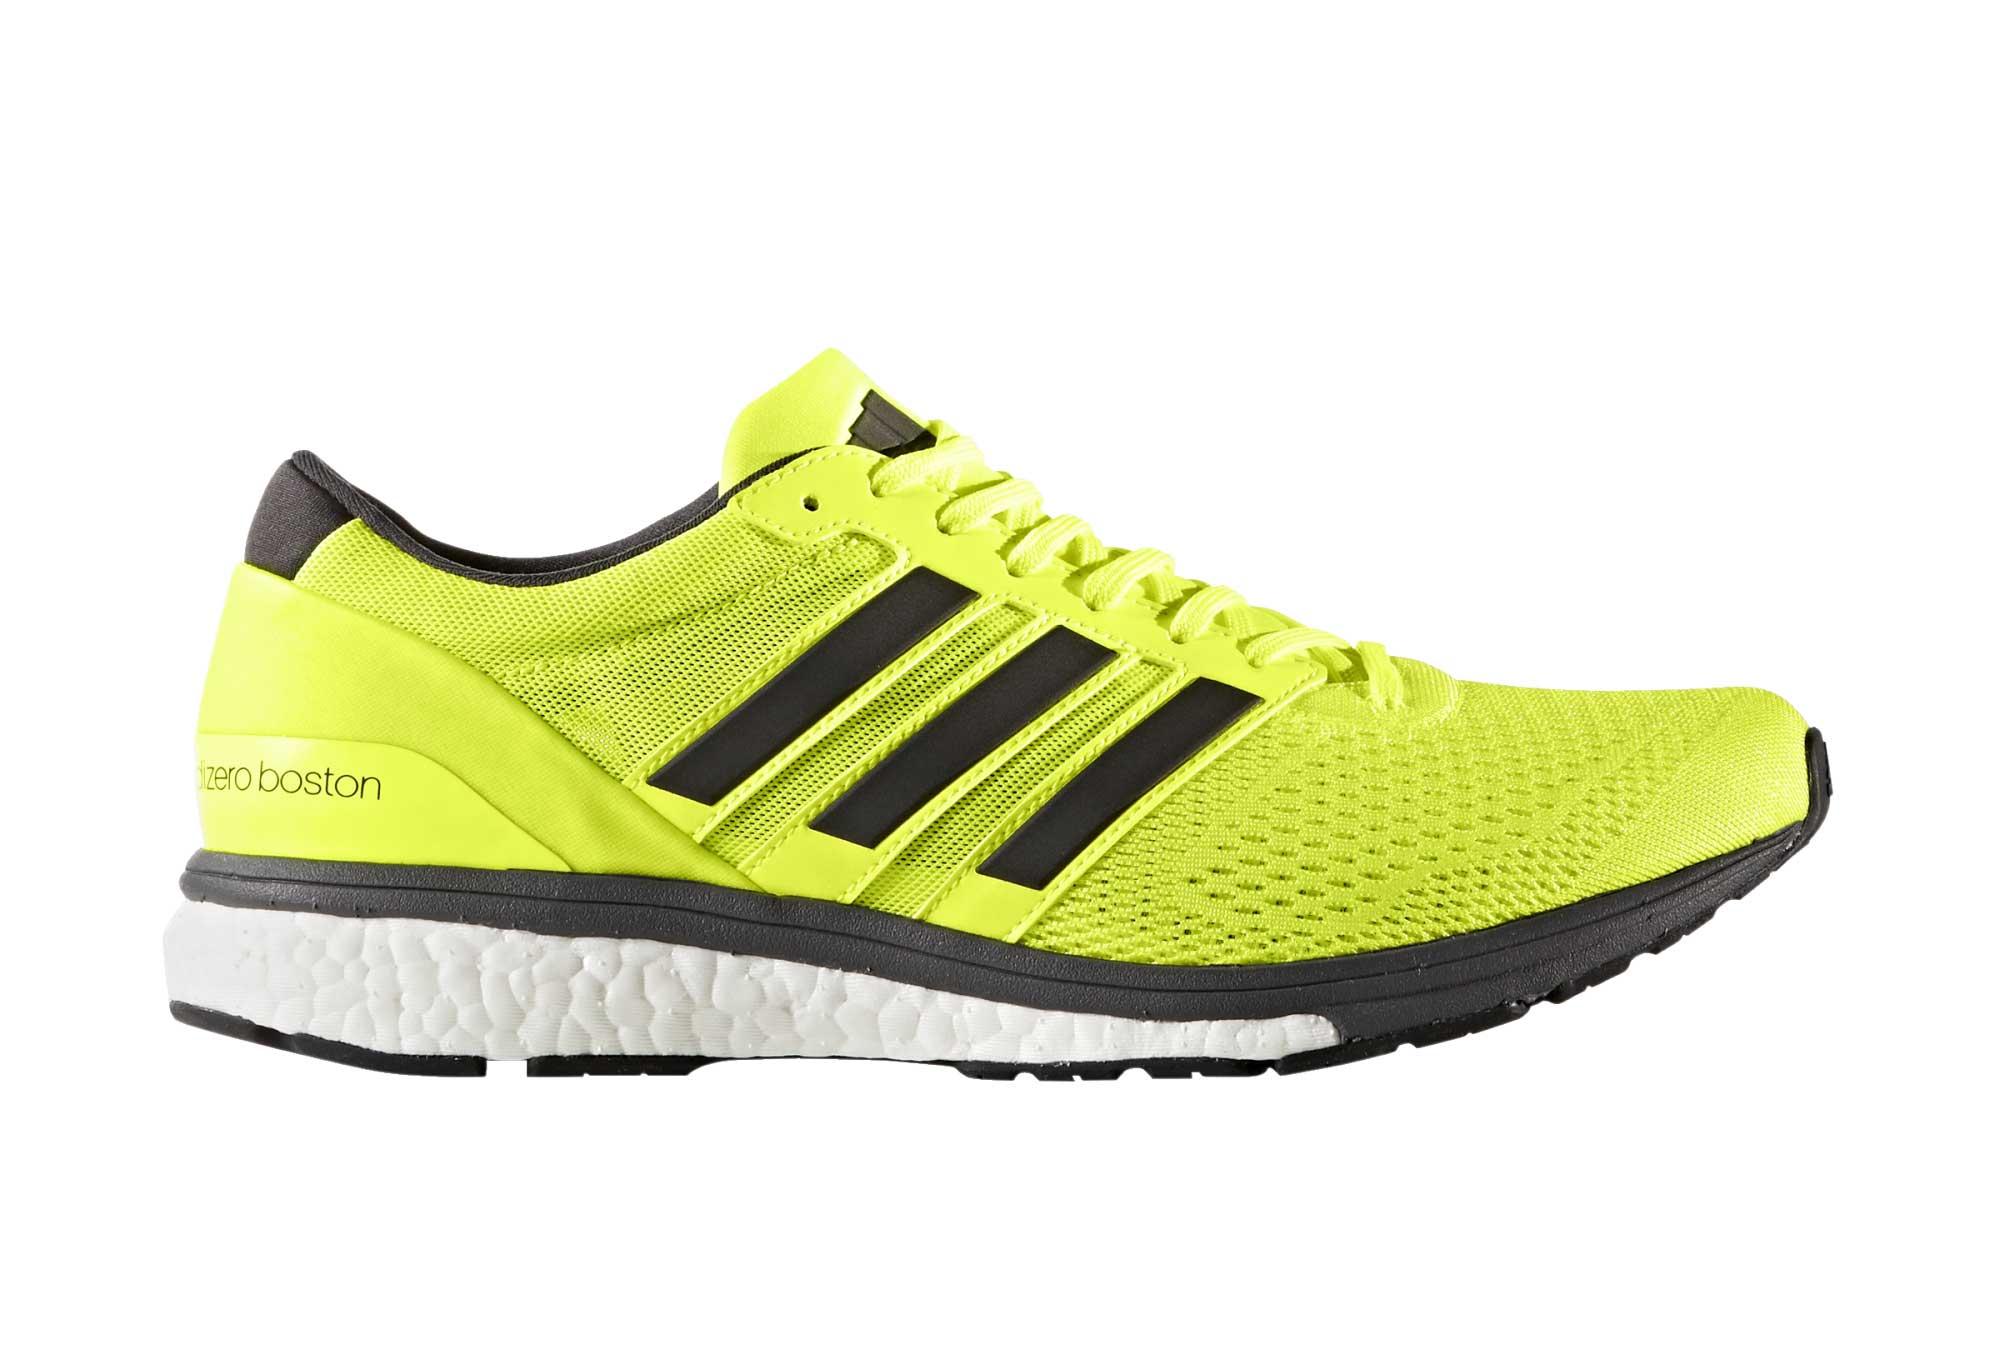 Fluo Running Boston 6 De Chaussures Jaune Adizero Adidas vxqqTF